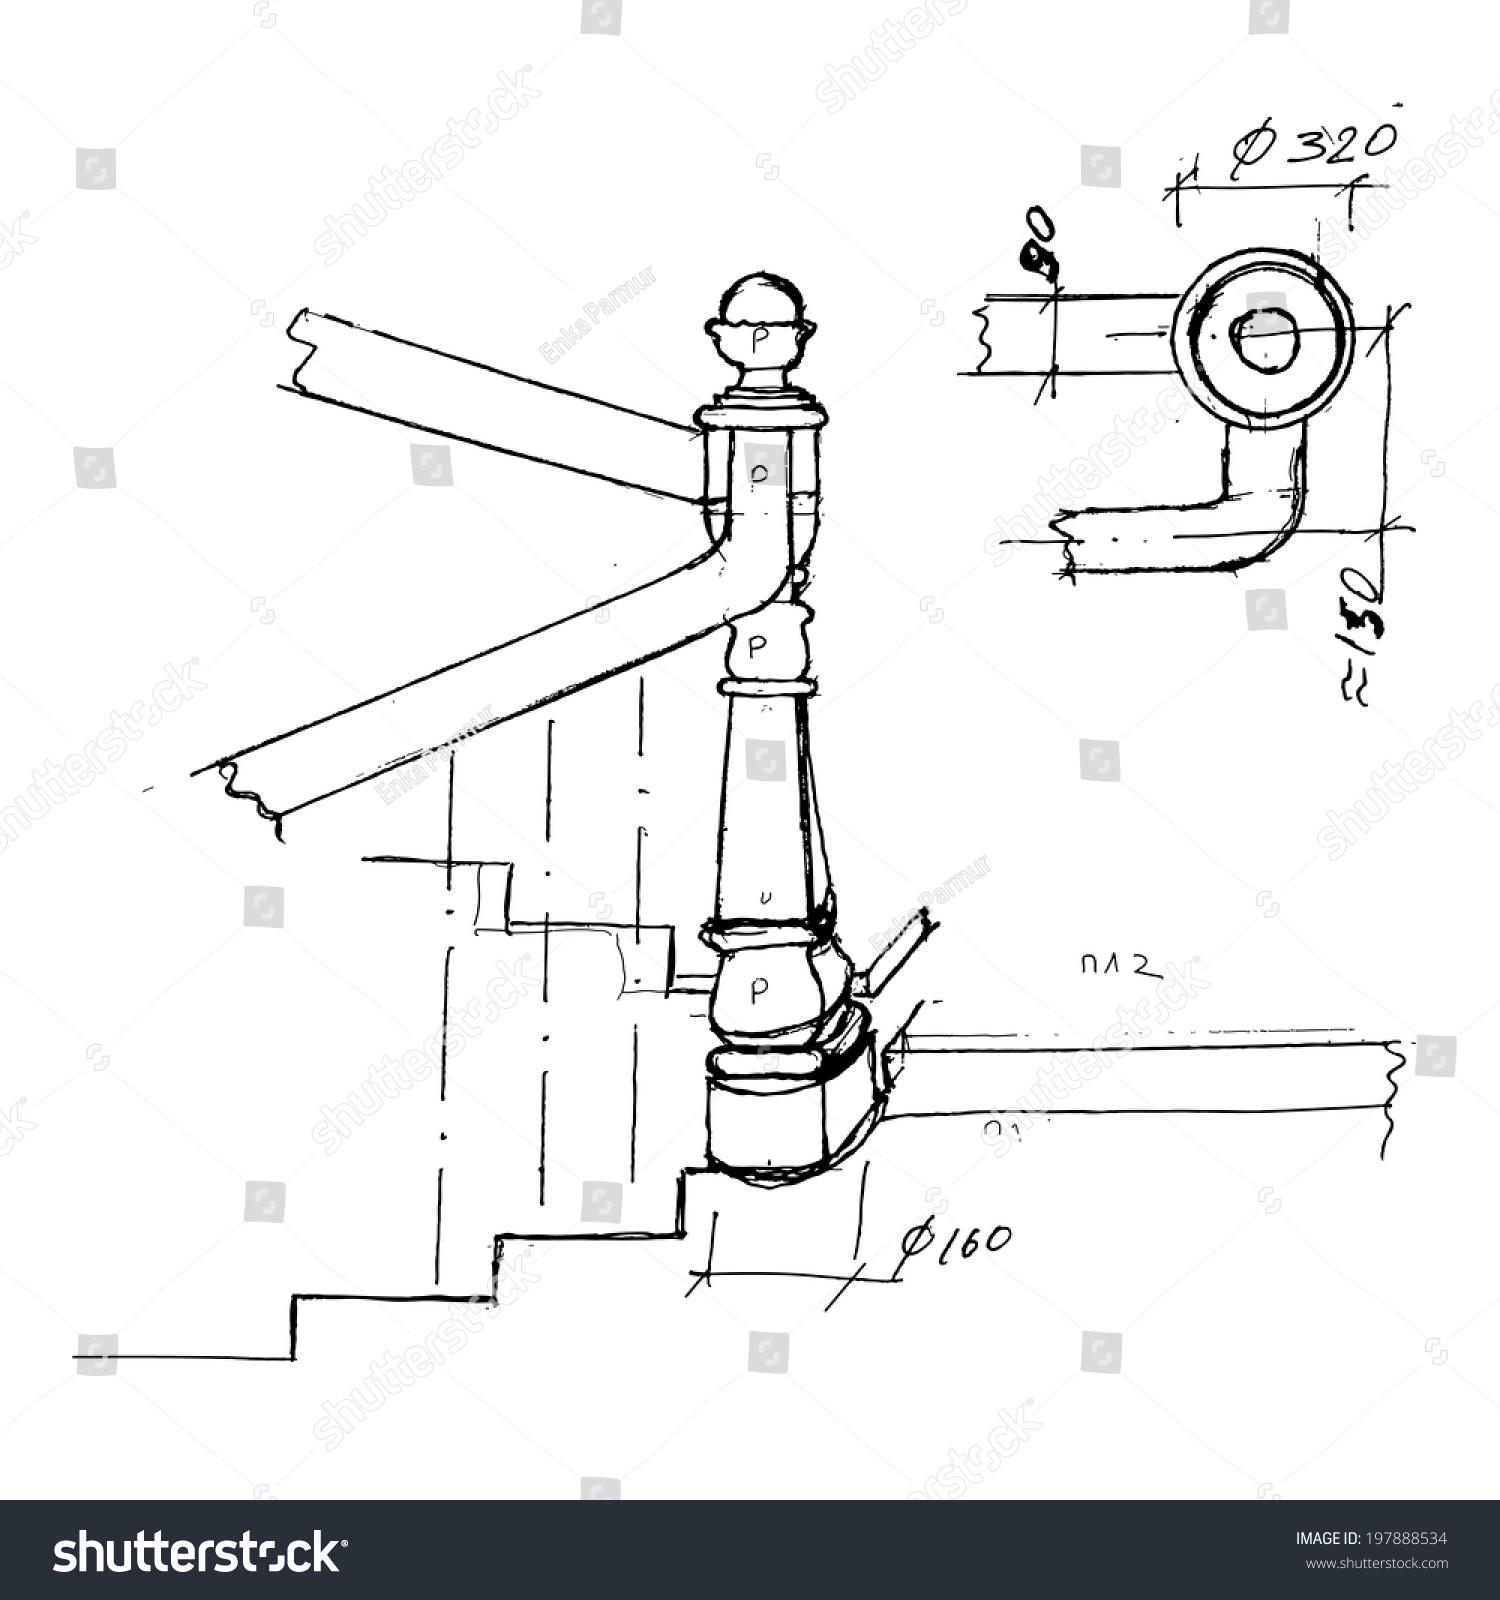 Charming Stair Part Draft Sketch. Black Outline On White Background. Vector  Illustration.